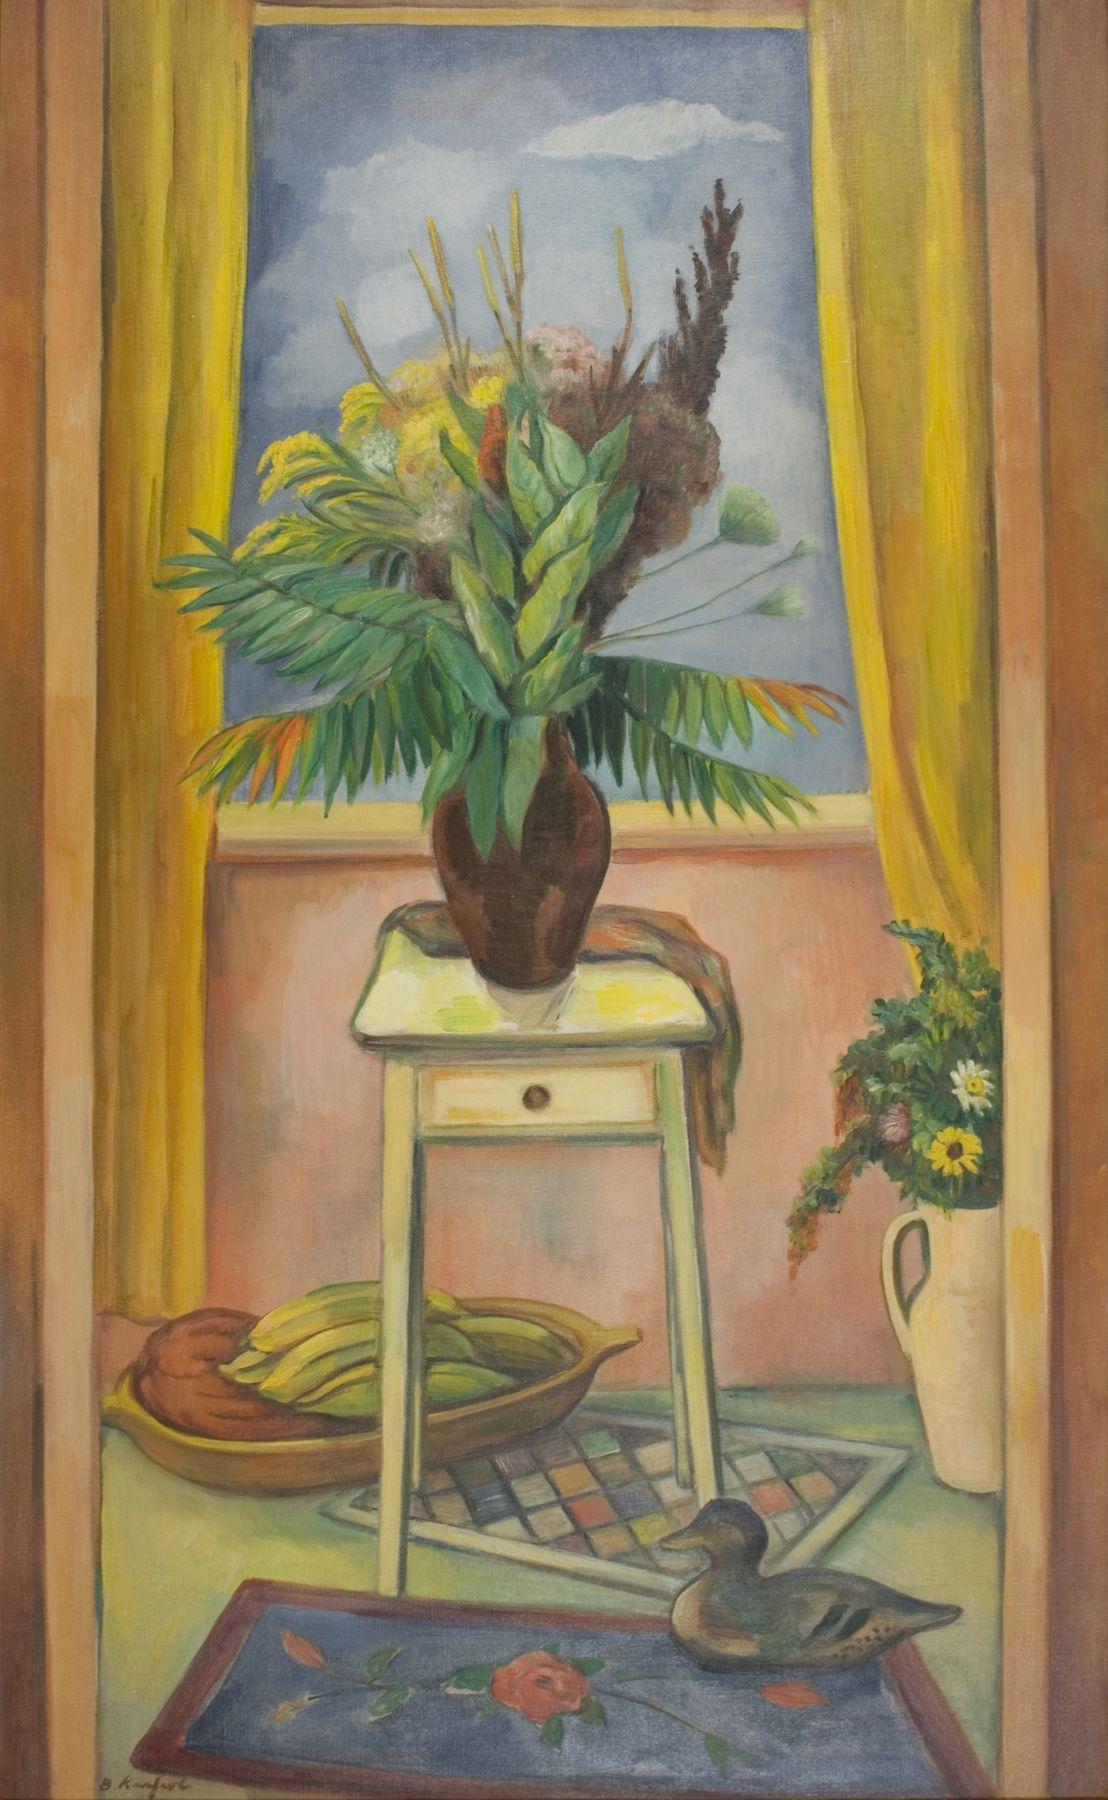 bernard karfiol, Still-life with Milkweed and Wild Stuff, 1947, oil on canvas, 50 x 30 inches